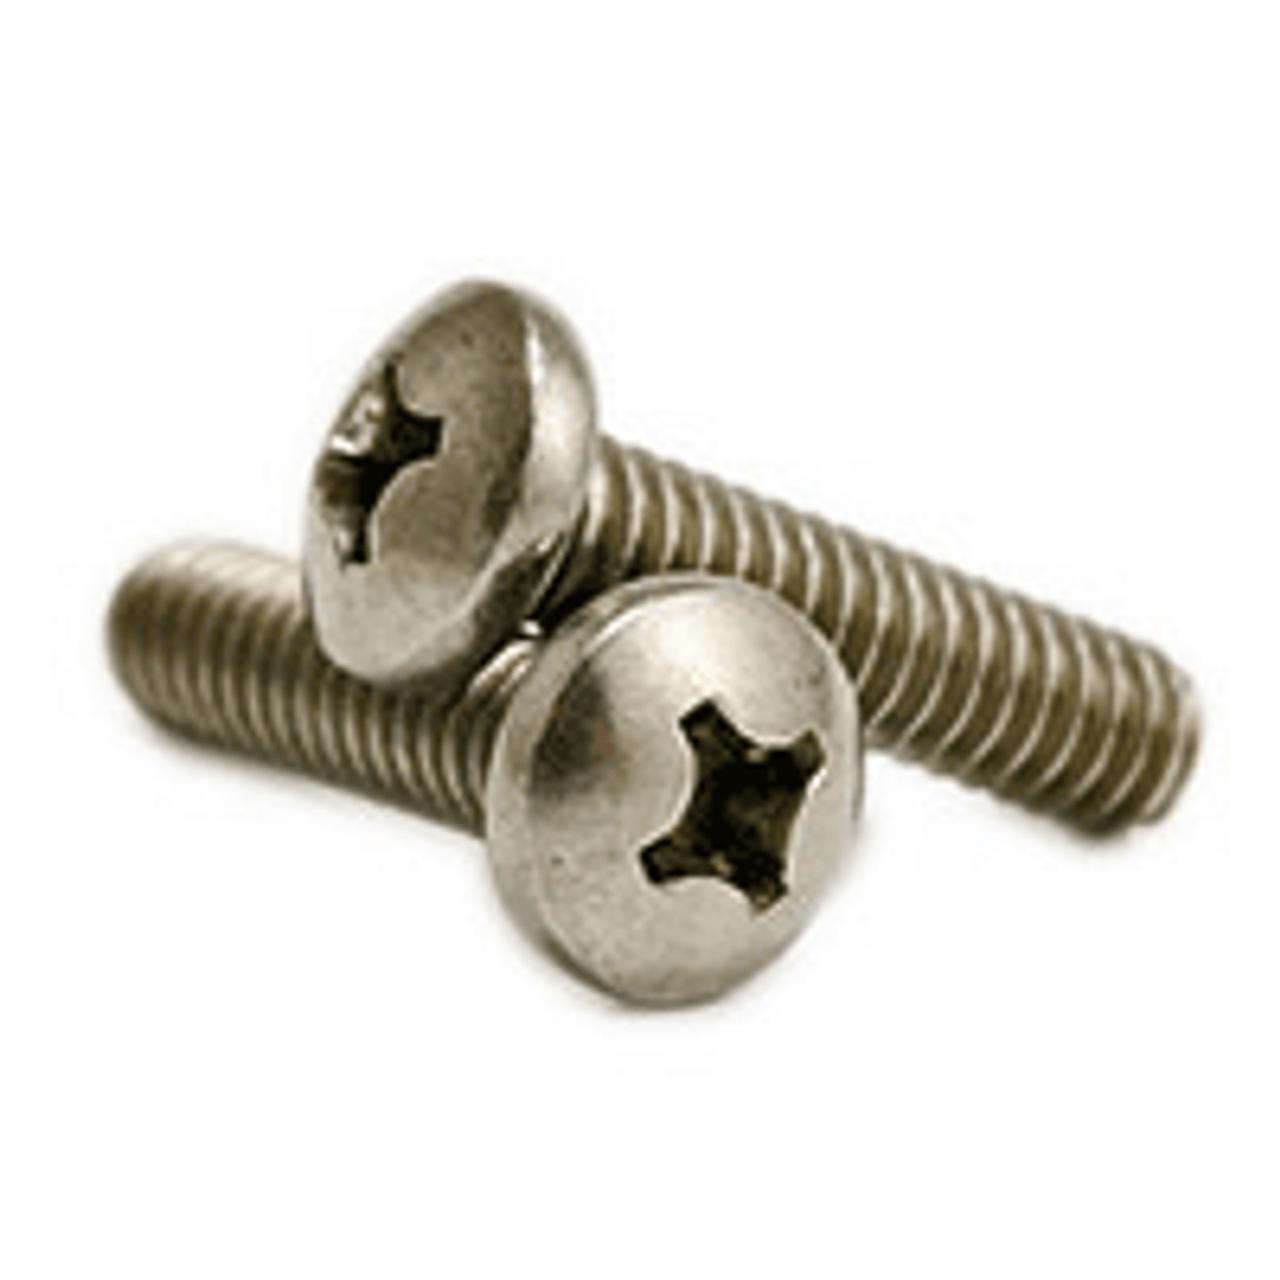 Bolzen Mounting Set Nuts /& Bolts Phillips Head Pan Head